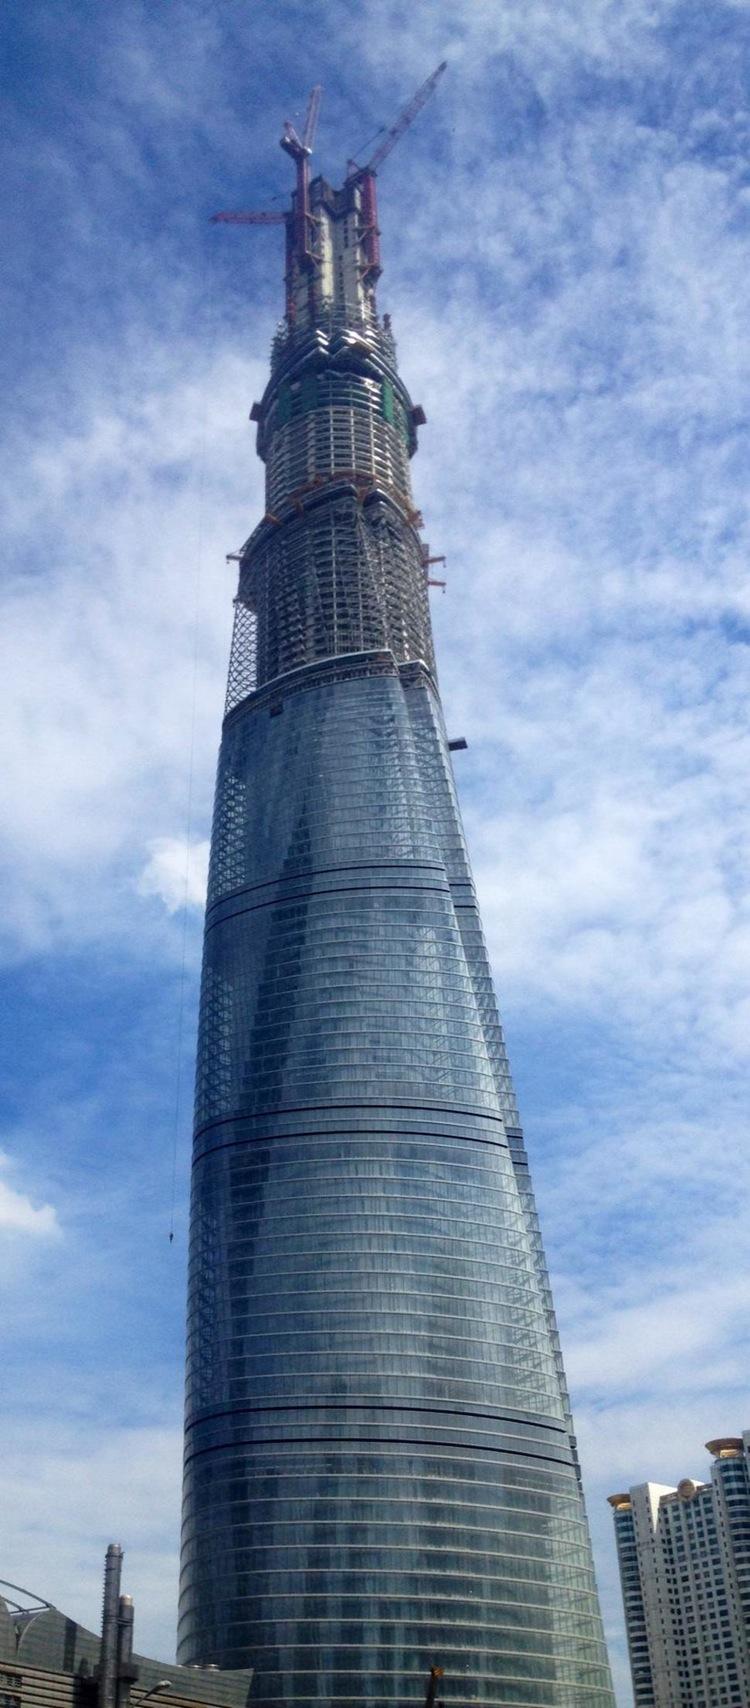 AD-Ο-30-Ψηλότερα κτίρια-in-the-World-In-Sizer-Παραγγελία-02